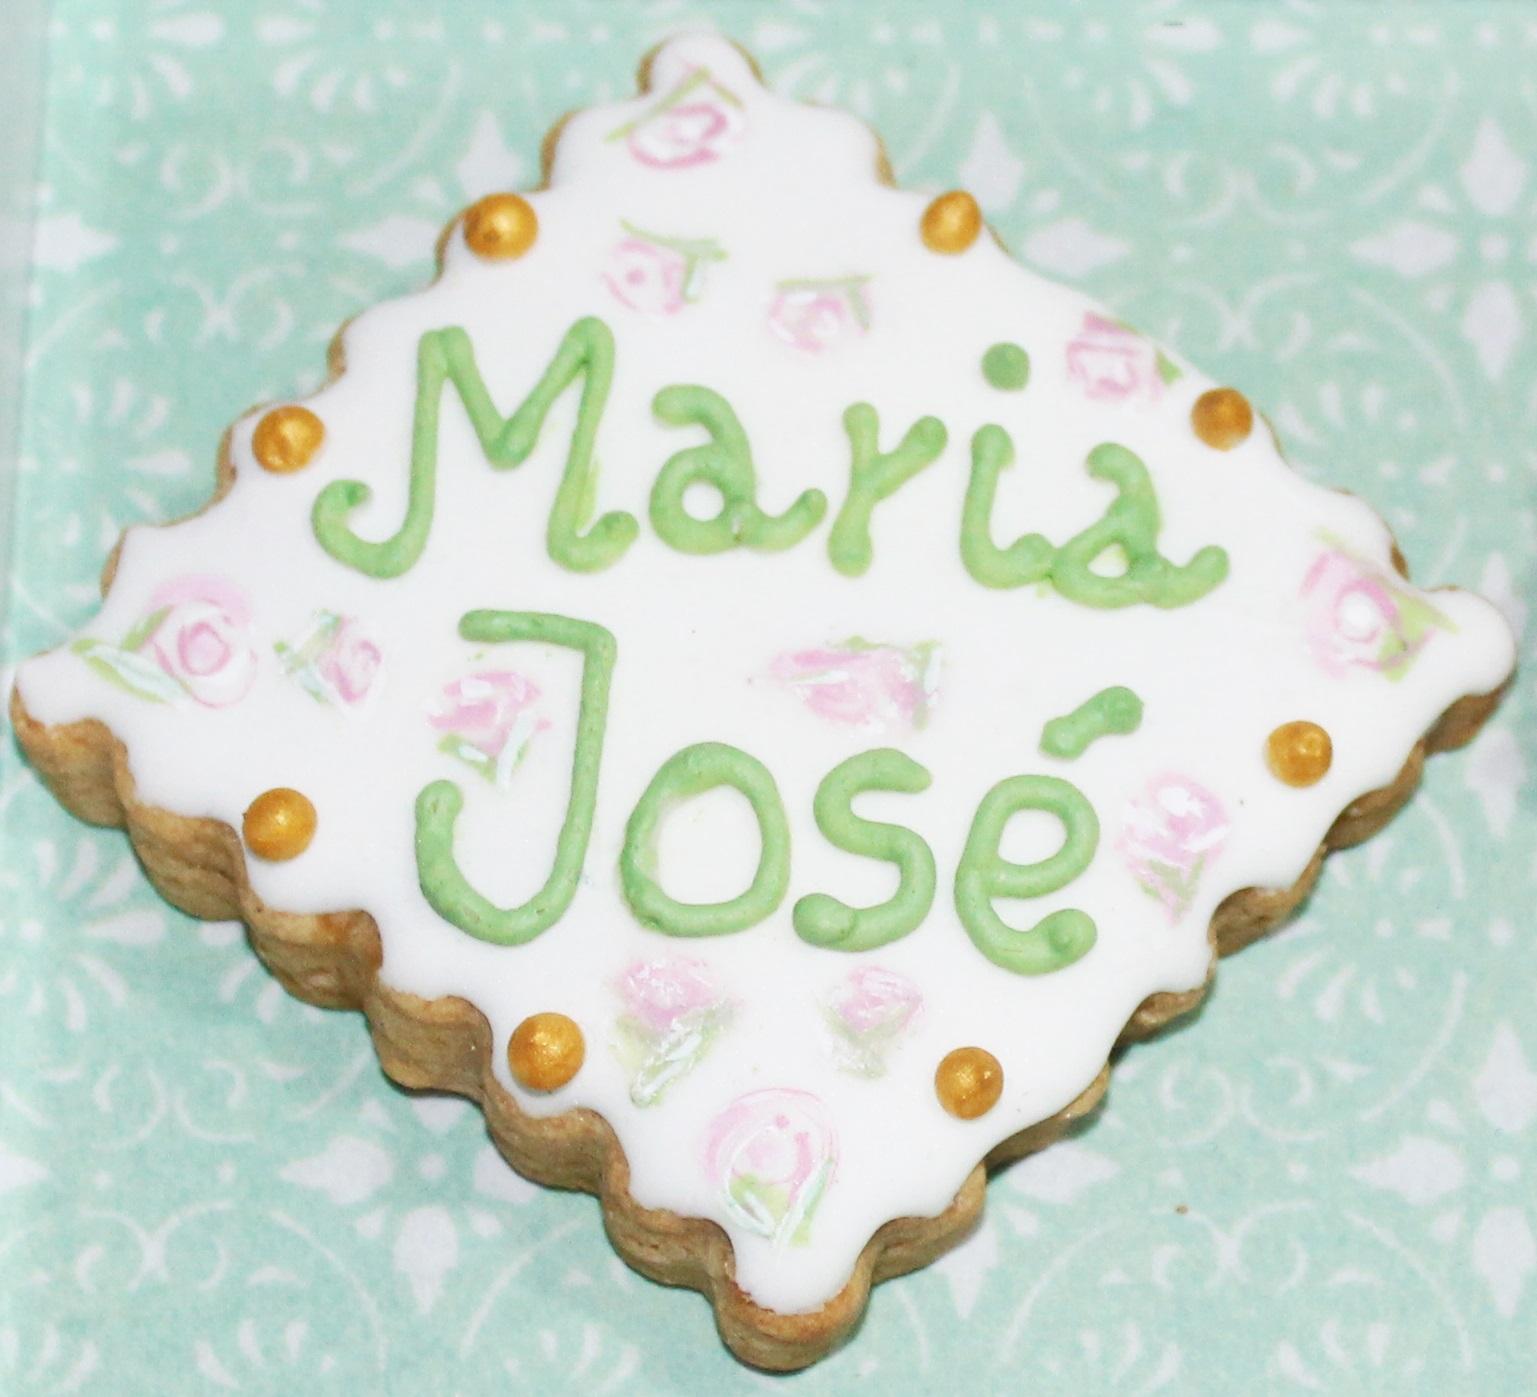 MARIA-JOSE-GALLETA-PINTADA-SOBRE-GLASA-REAL